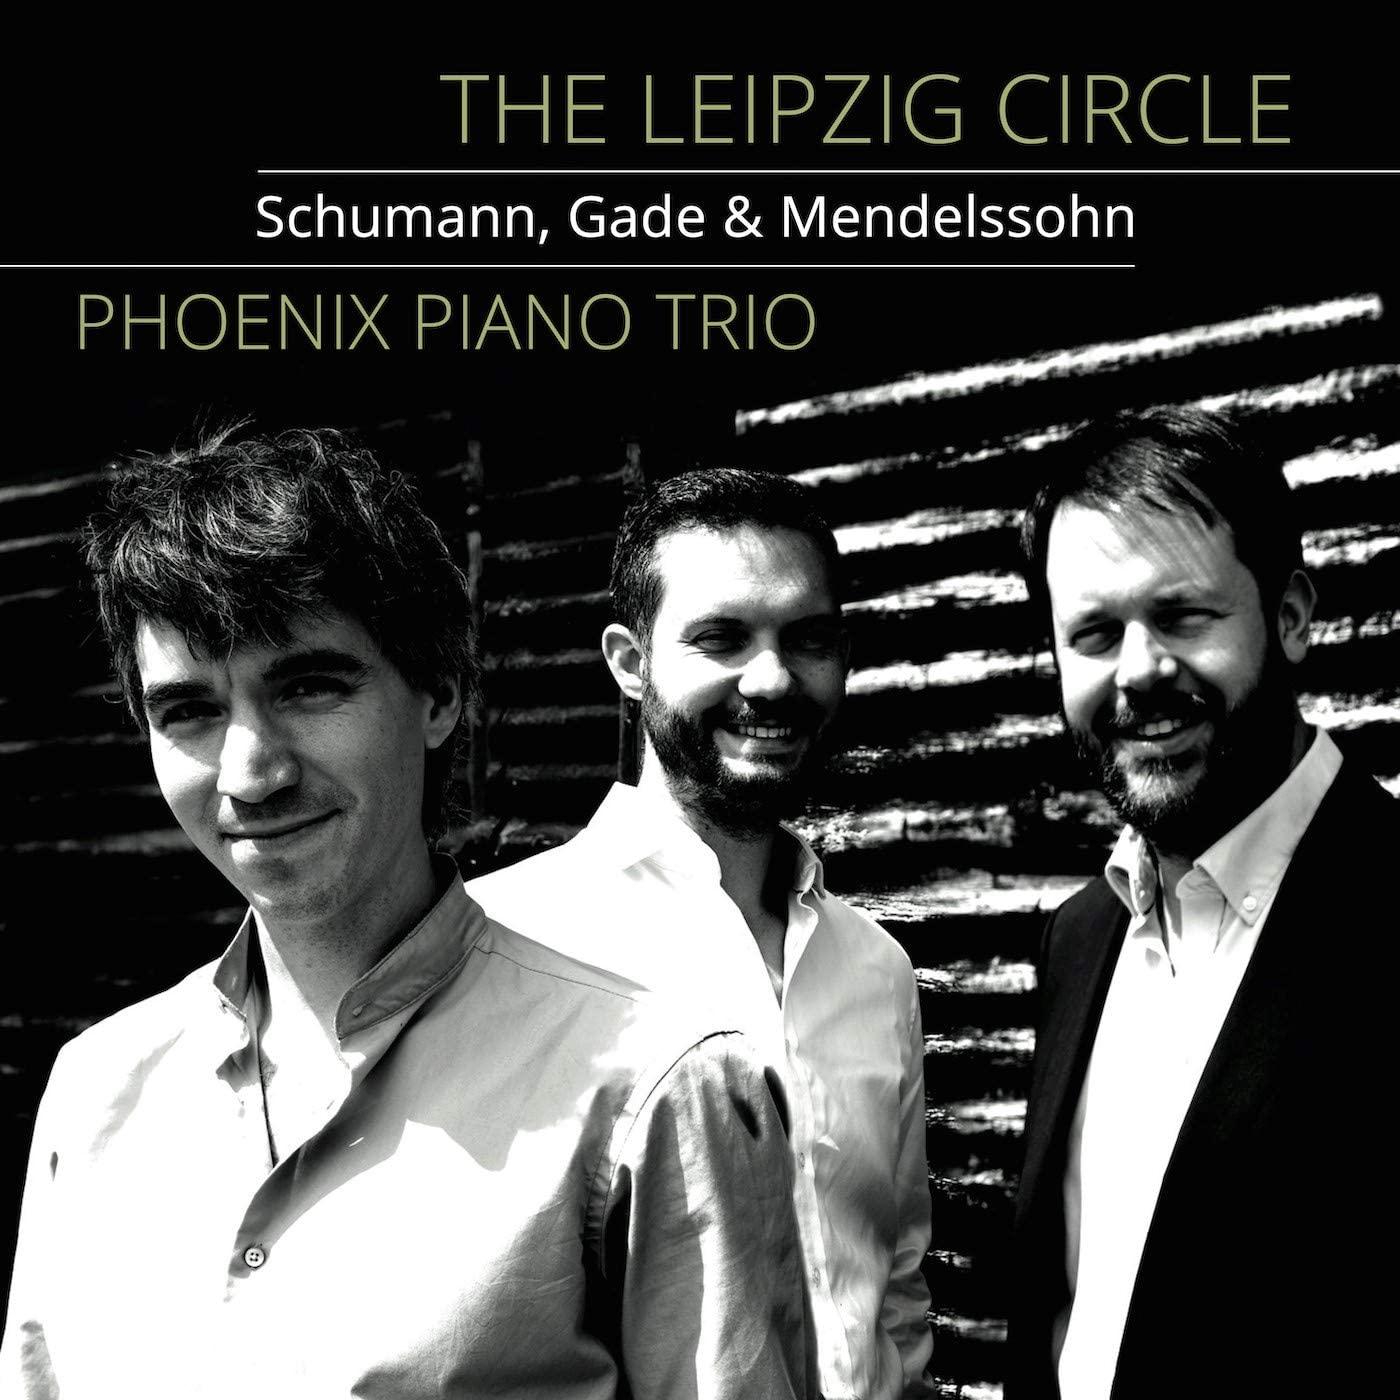 Review of Phoenix Piano Trio: The Leipzig Circle